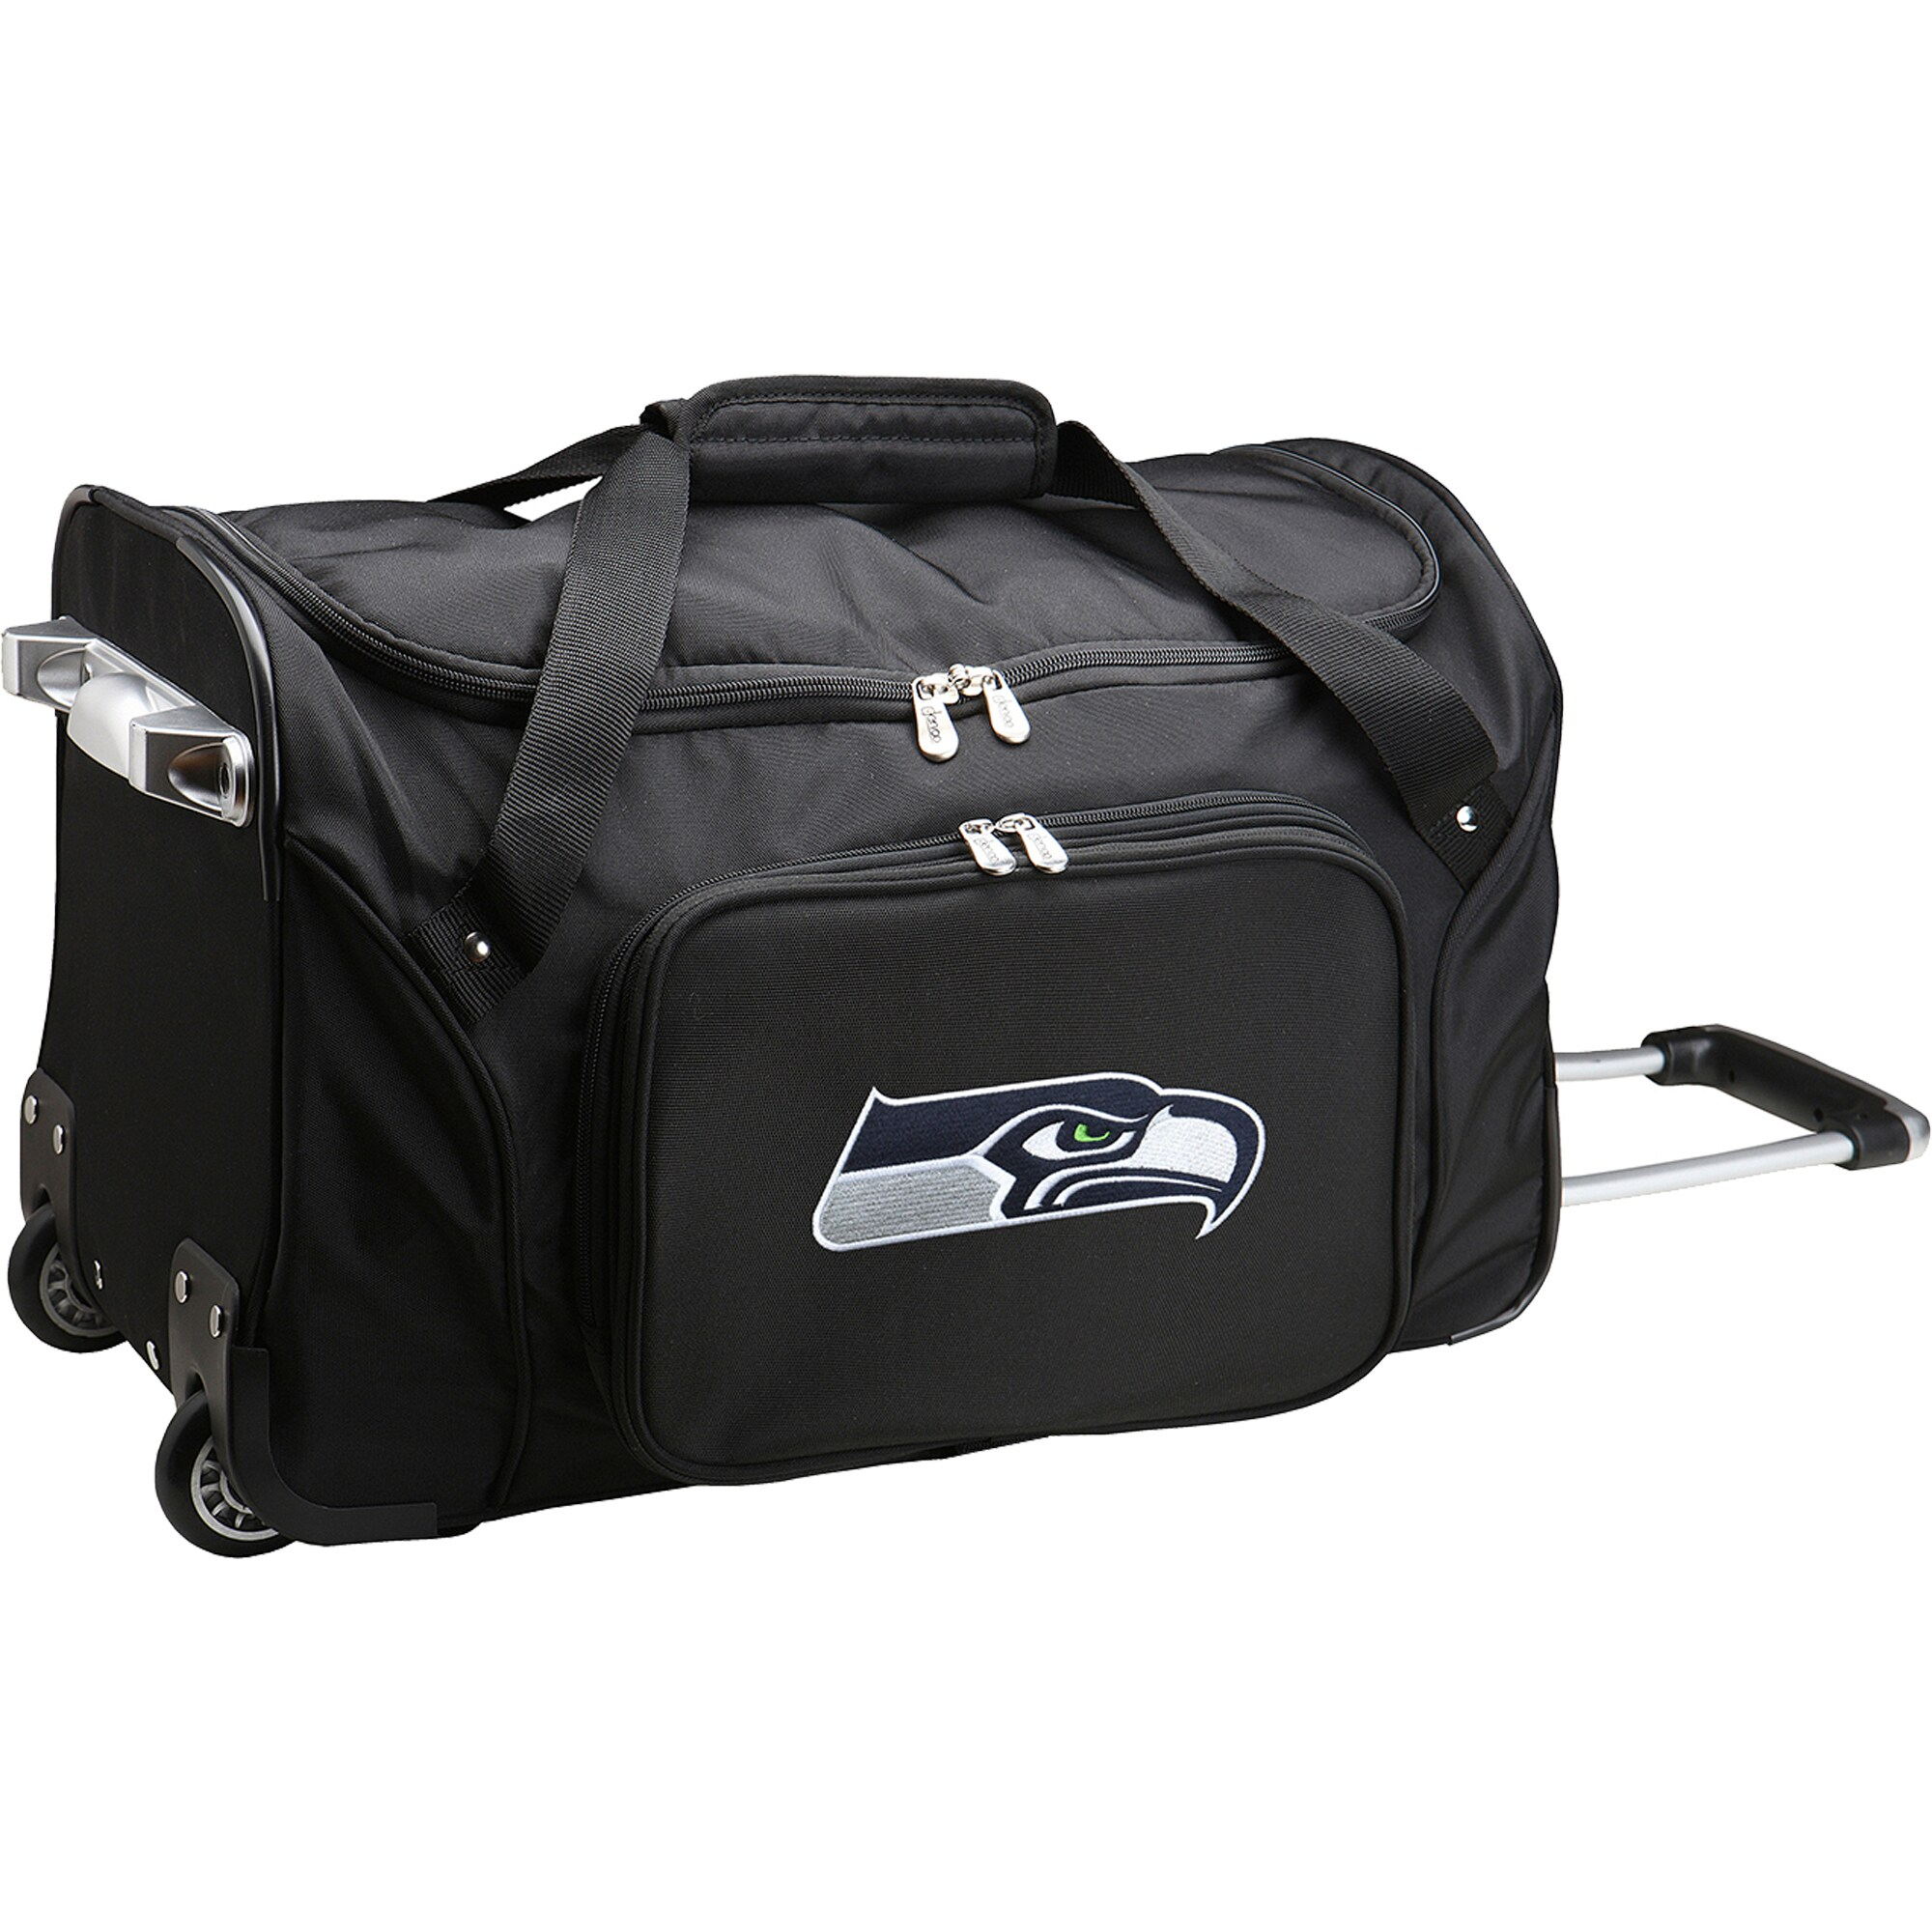 "Seattle Seahawks 22"" 2-Wheeled Duffel Bag - Black"